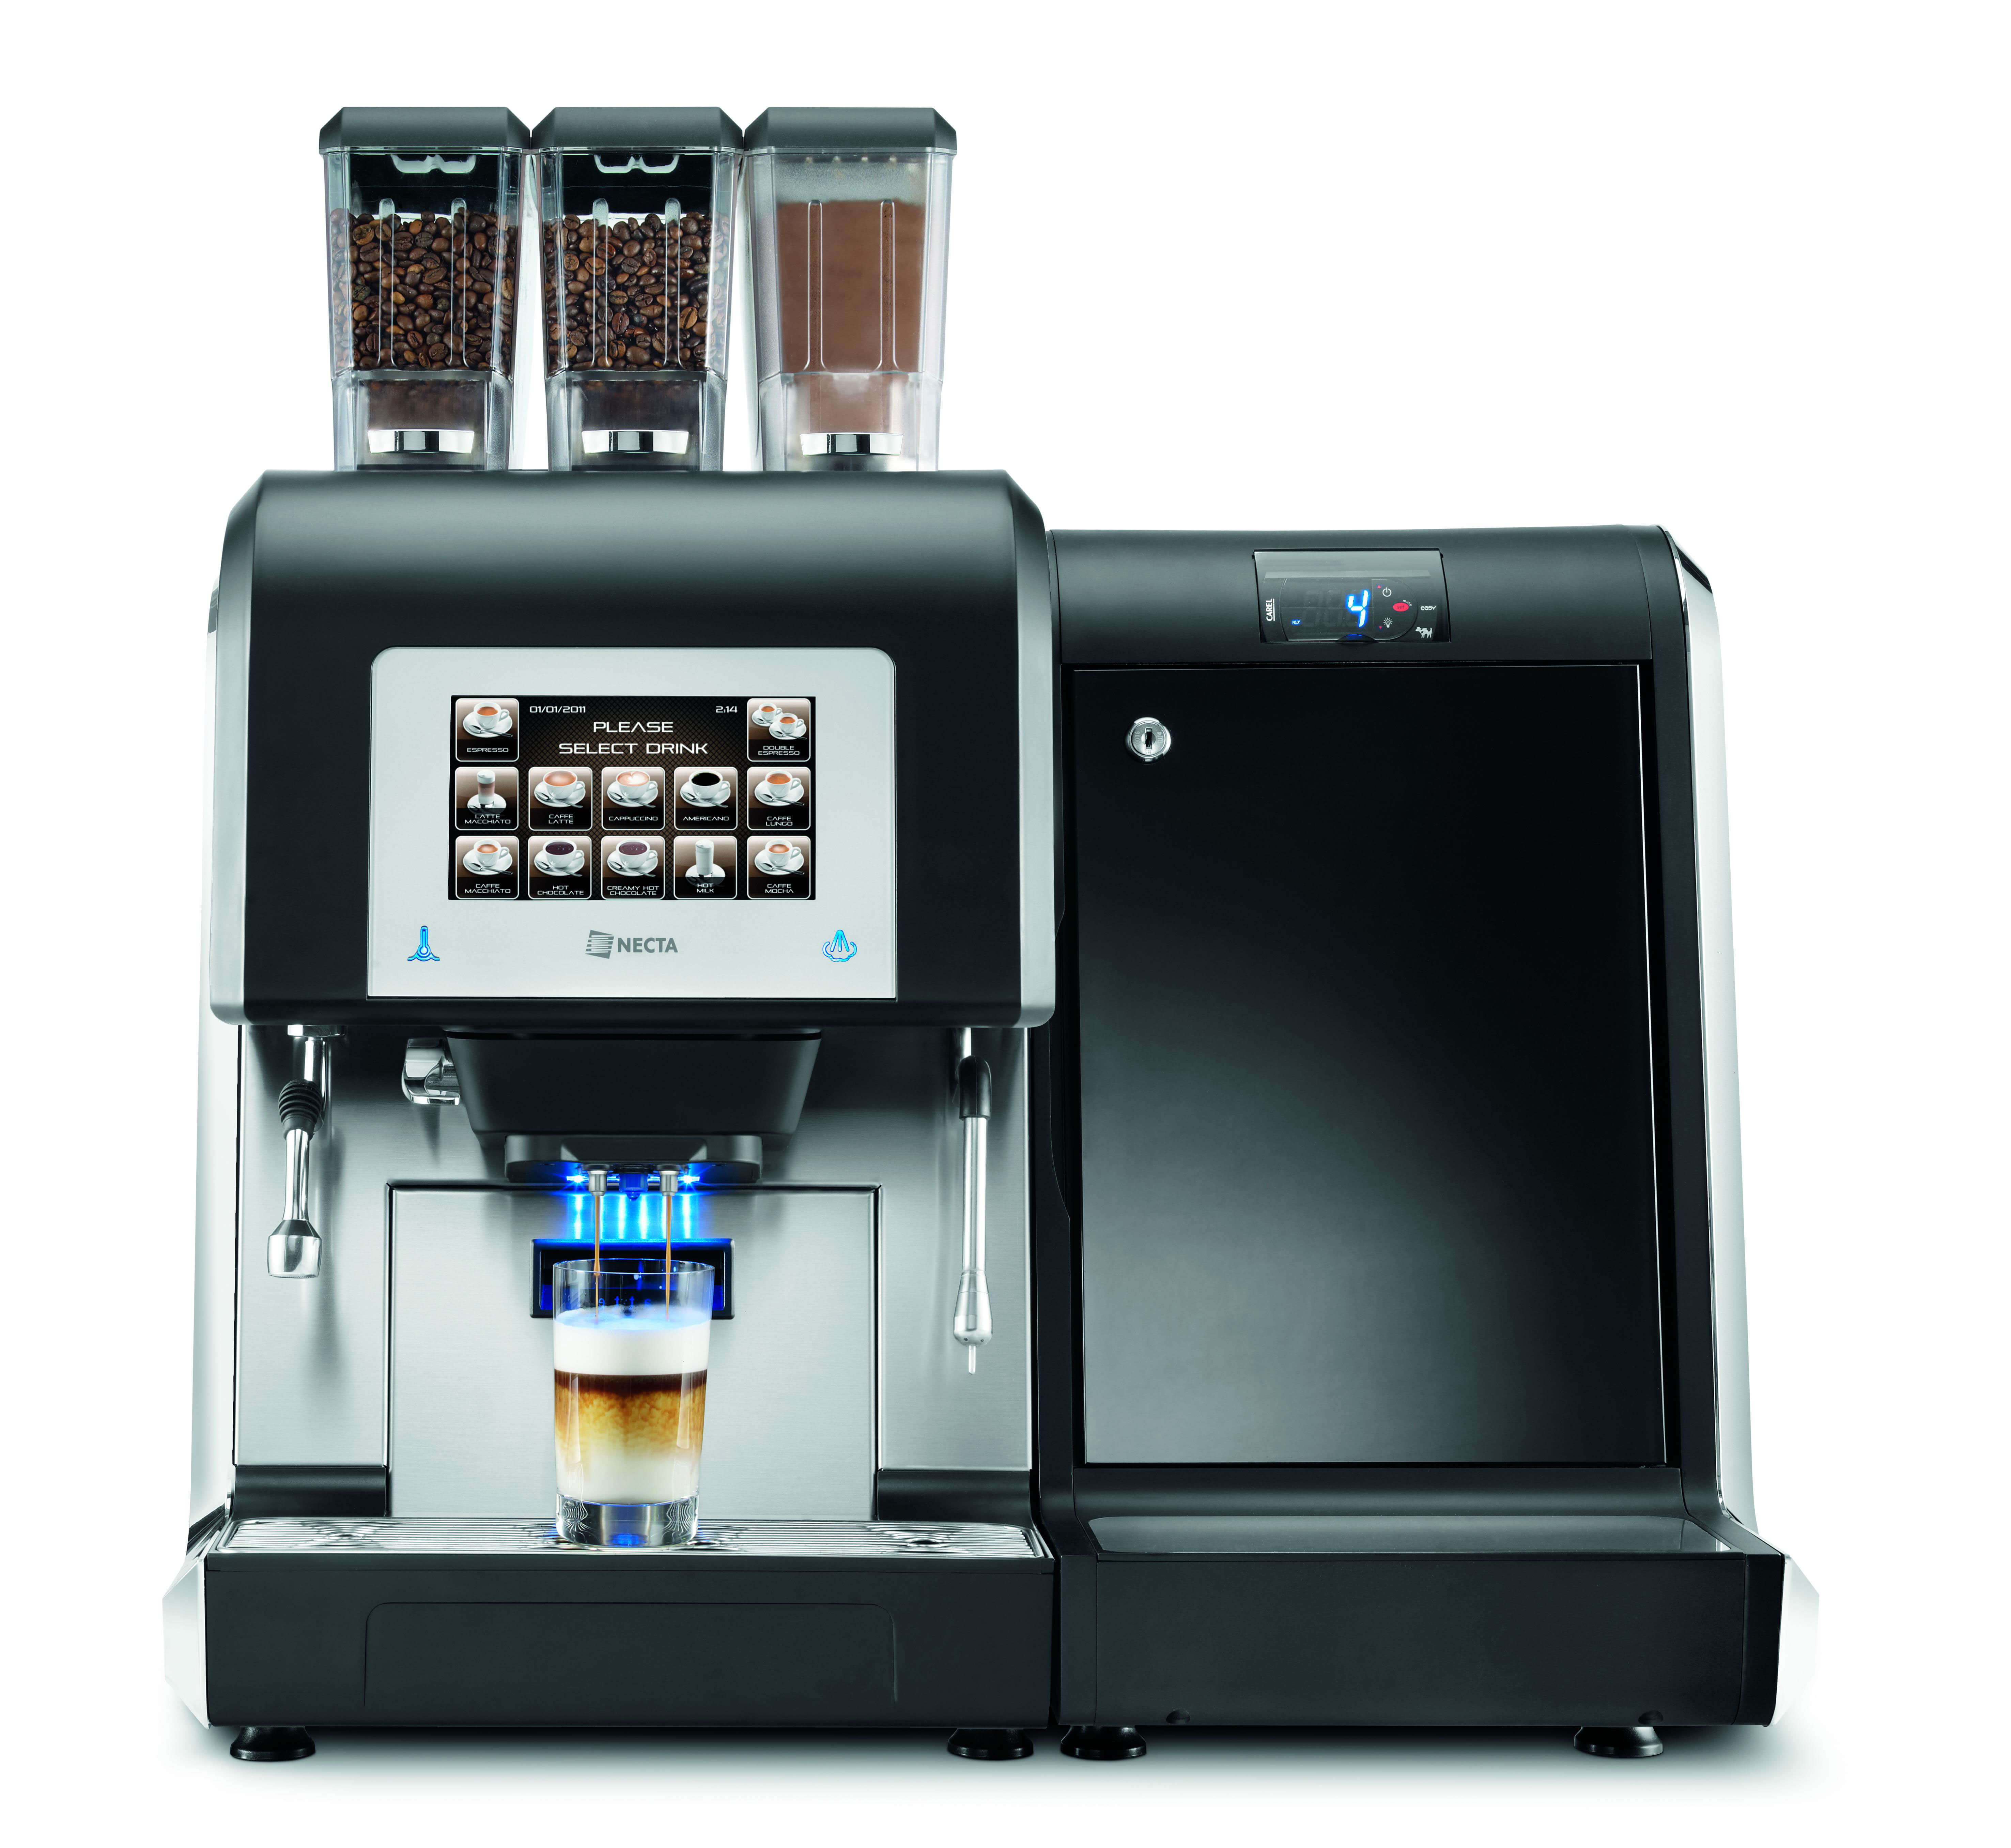 NECTA Karisma Doppel Espresso Frisch | Kamasega